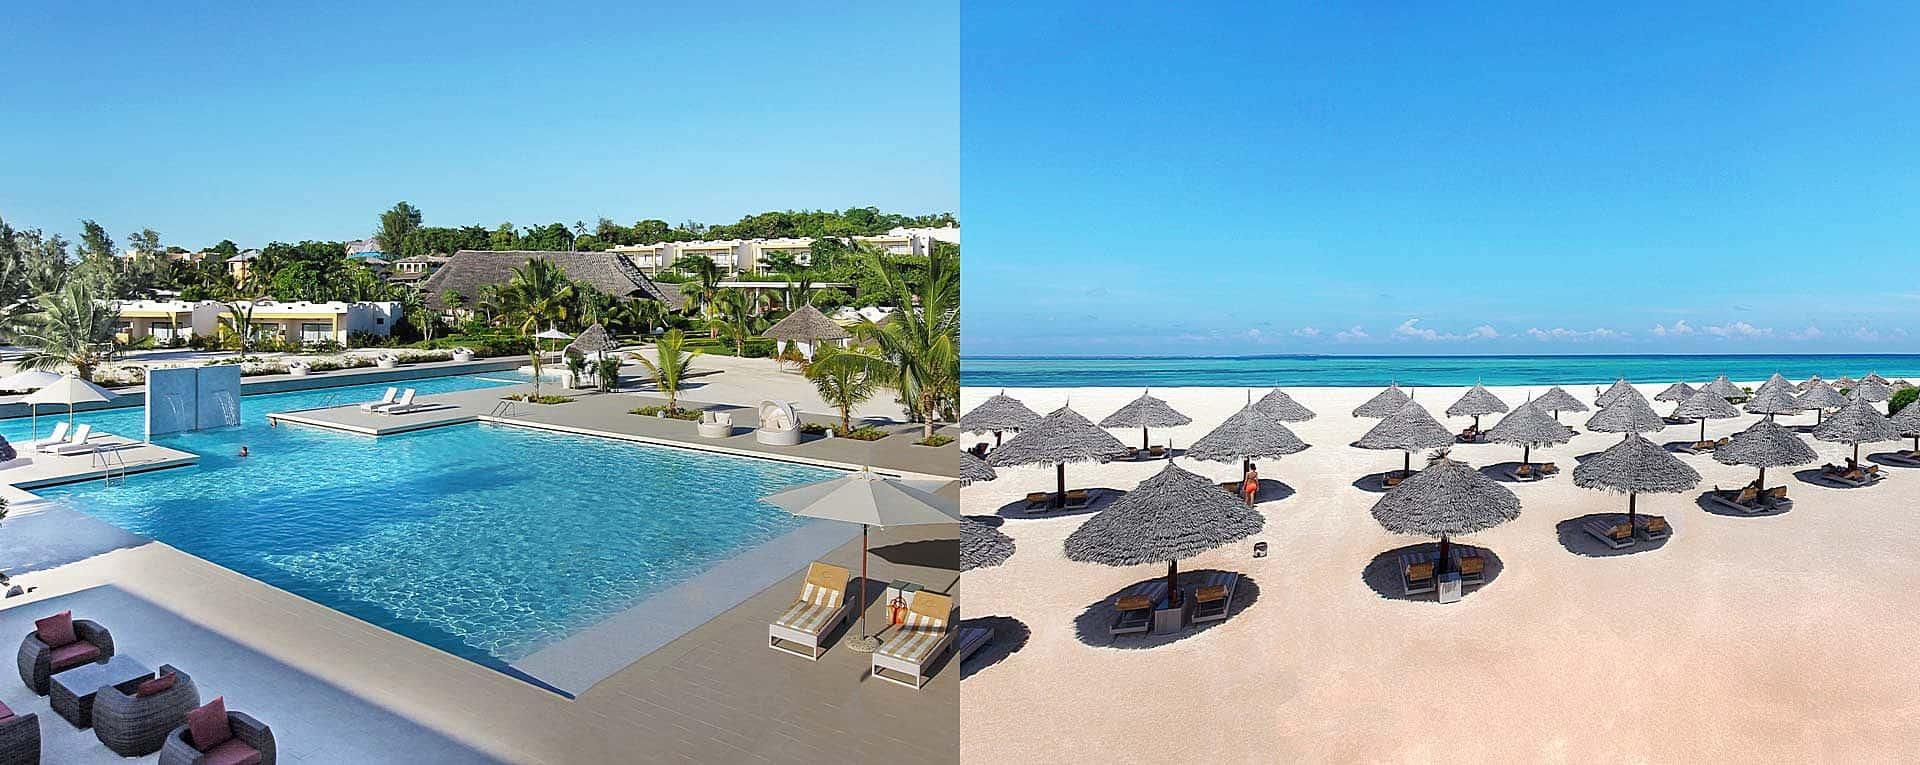 Gold Zanzibar Beach House Amp Spa Beach Accommodation In